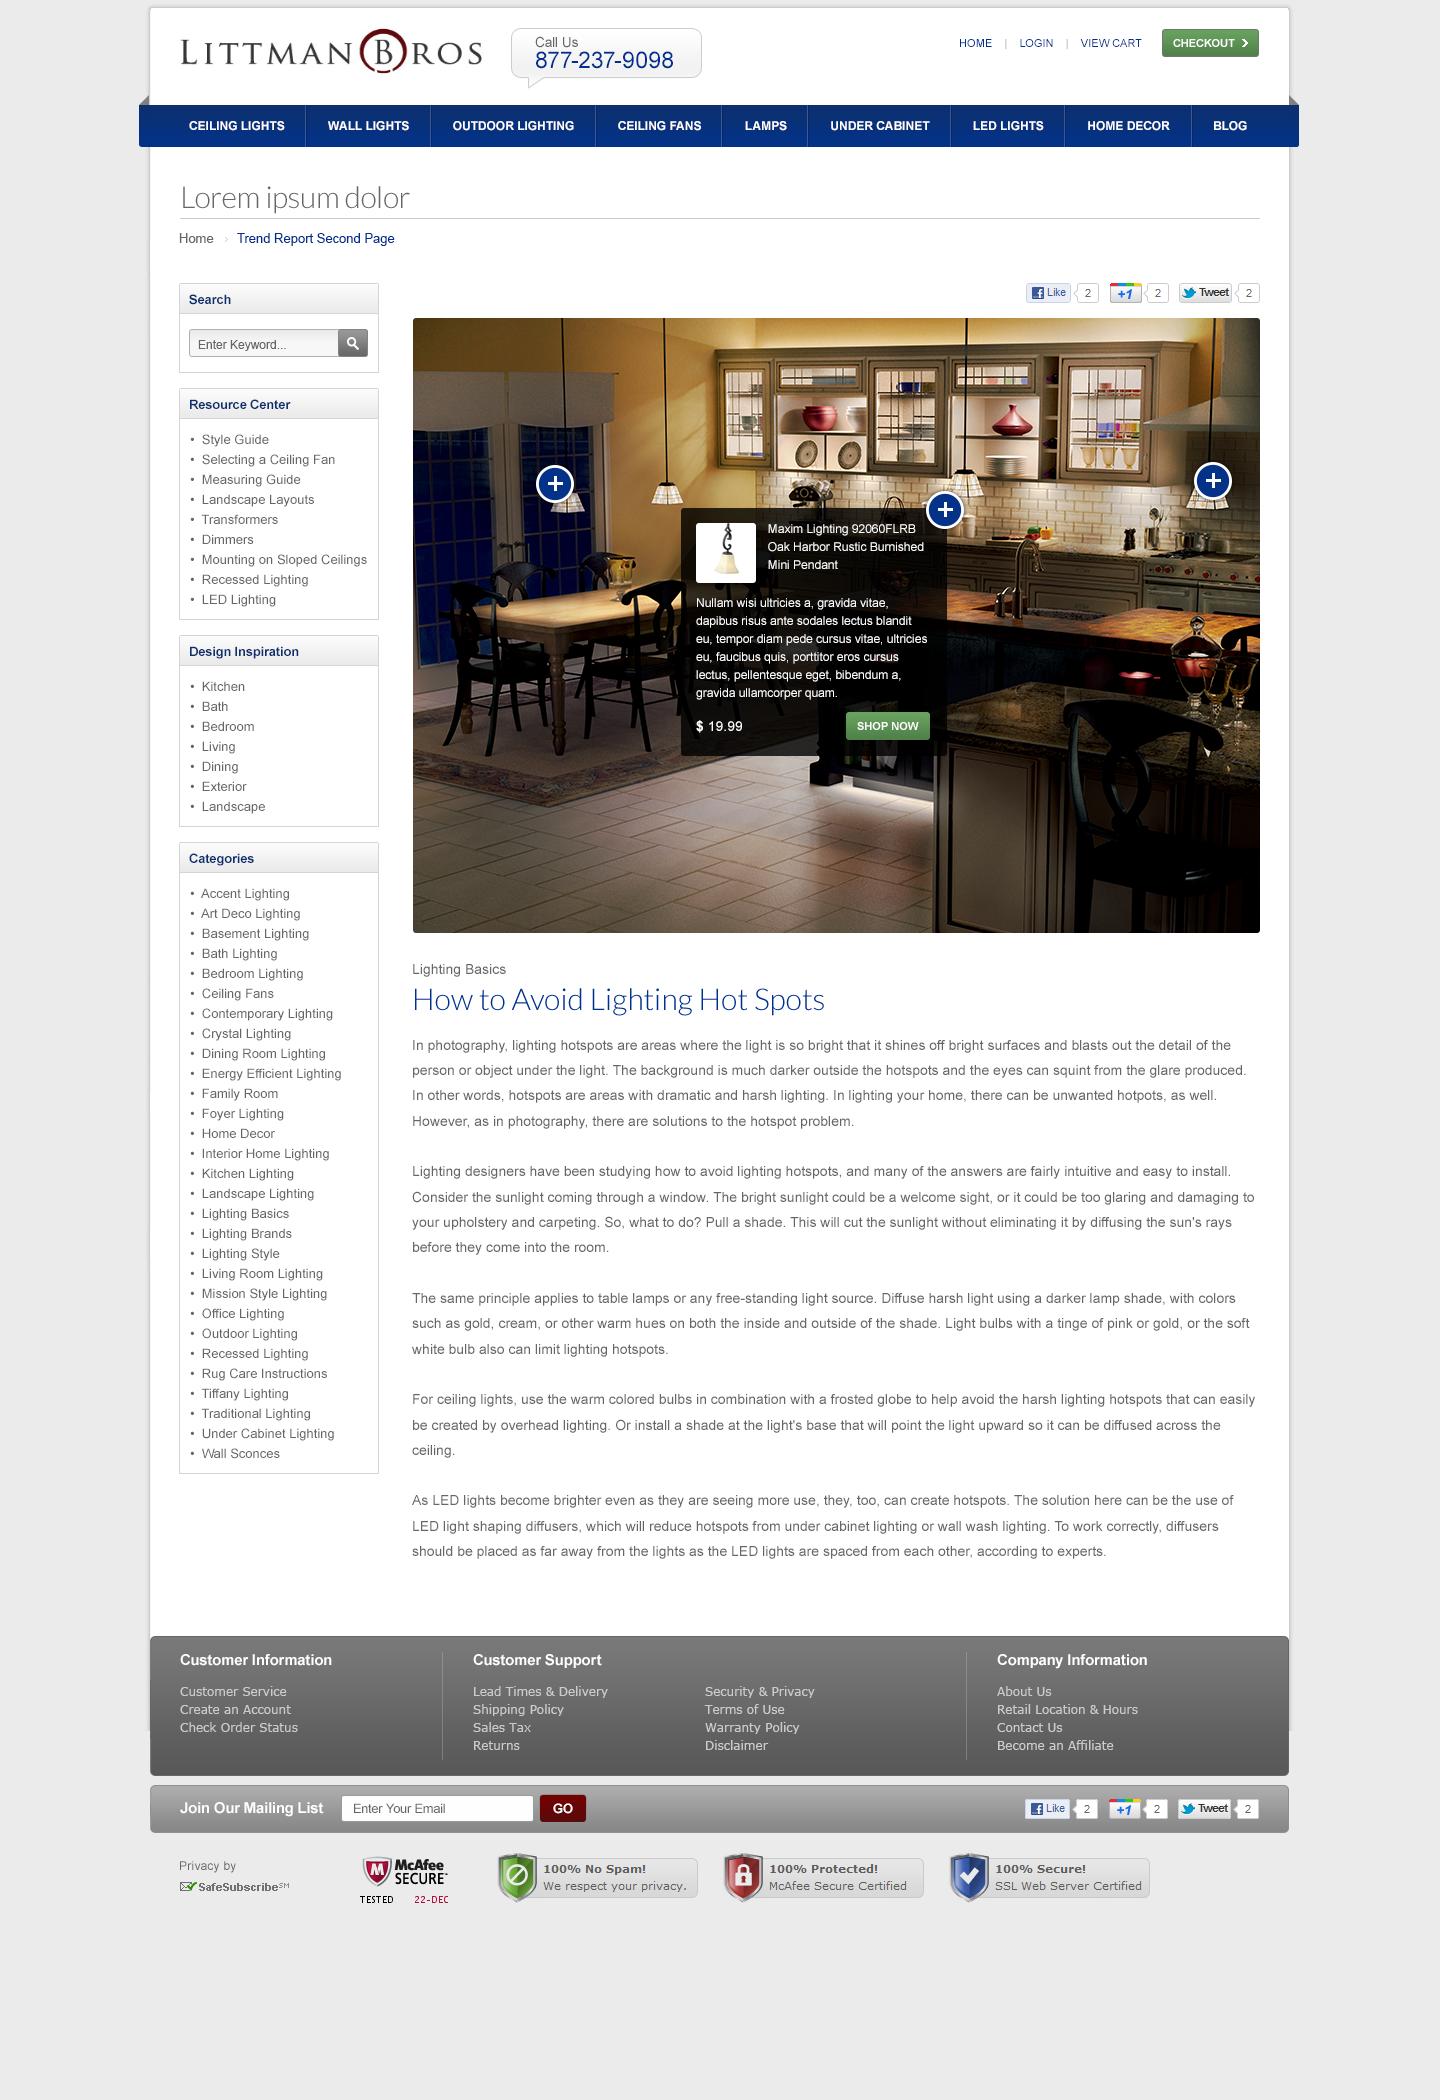 Littmanbros Com Responsive Blog Design Mockup To Match Ecommerce Site Ecommerce Design Responsive Blog Design Mockup Design